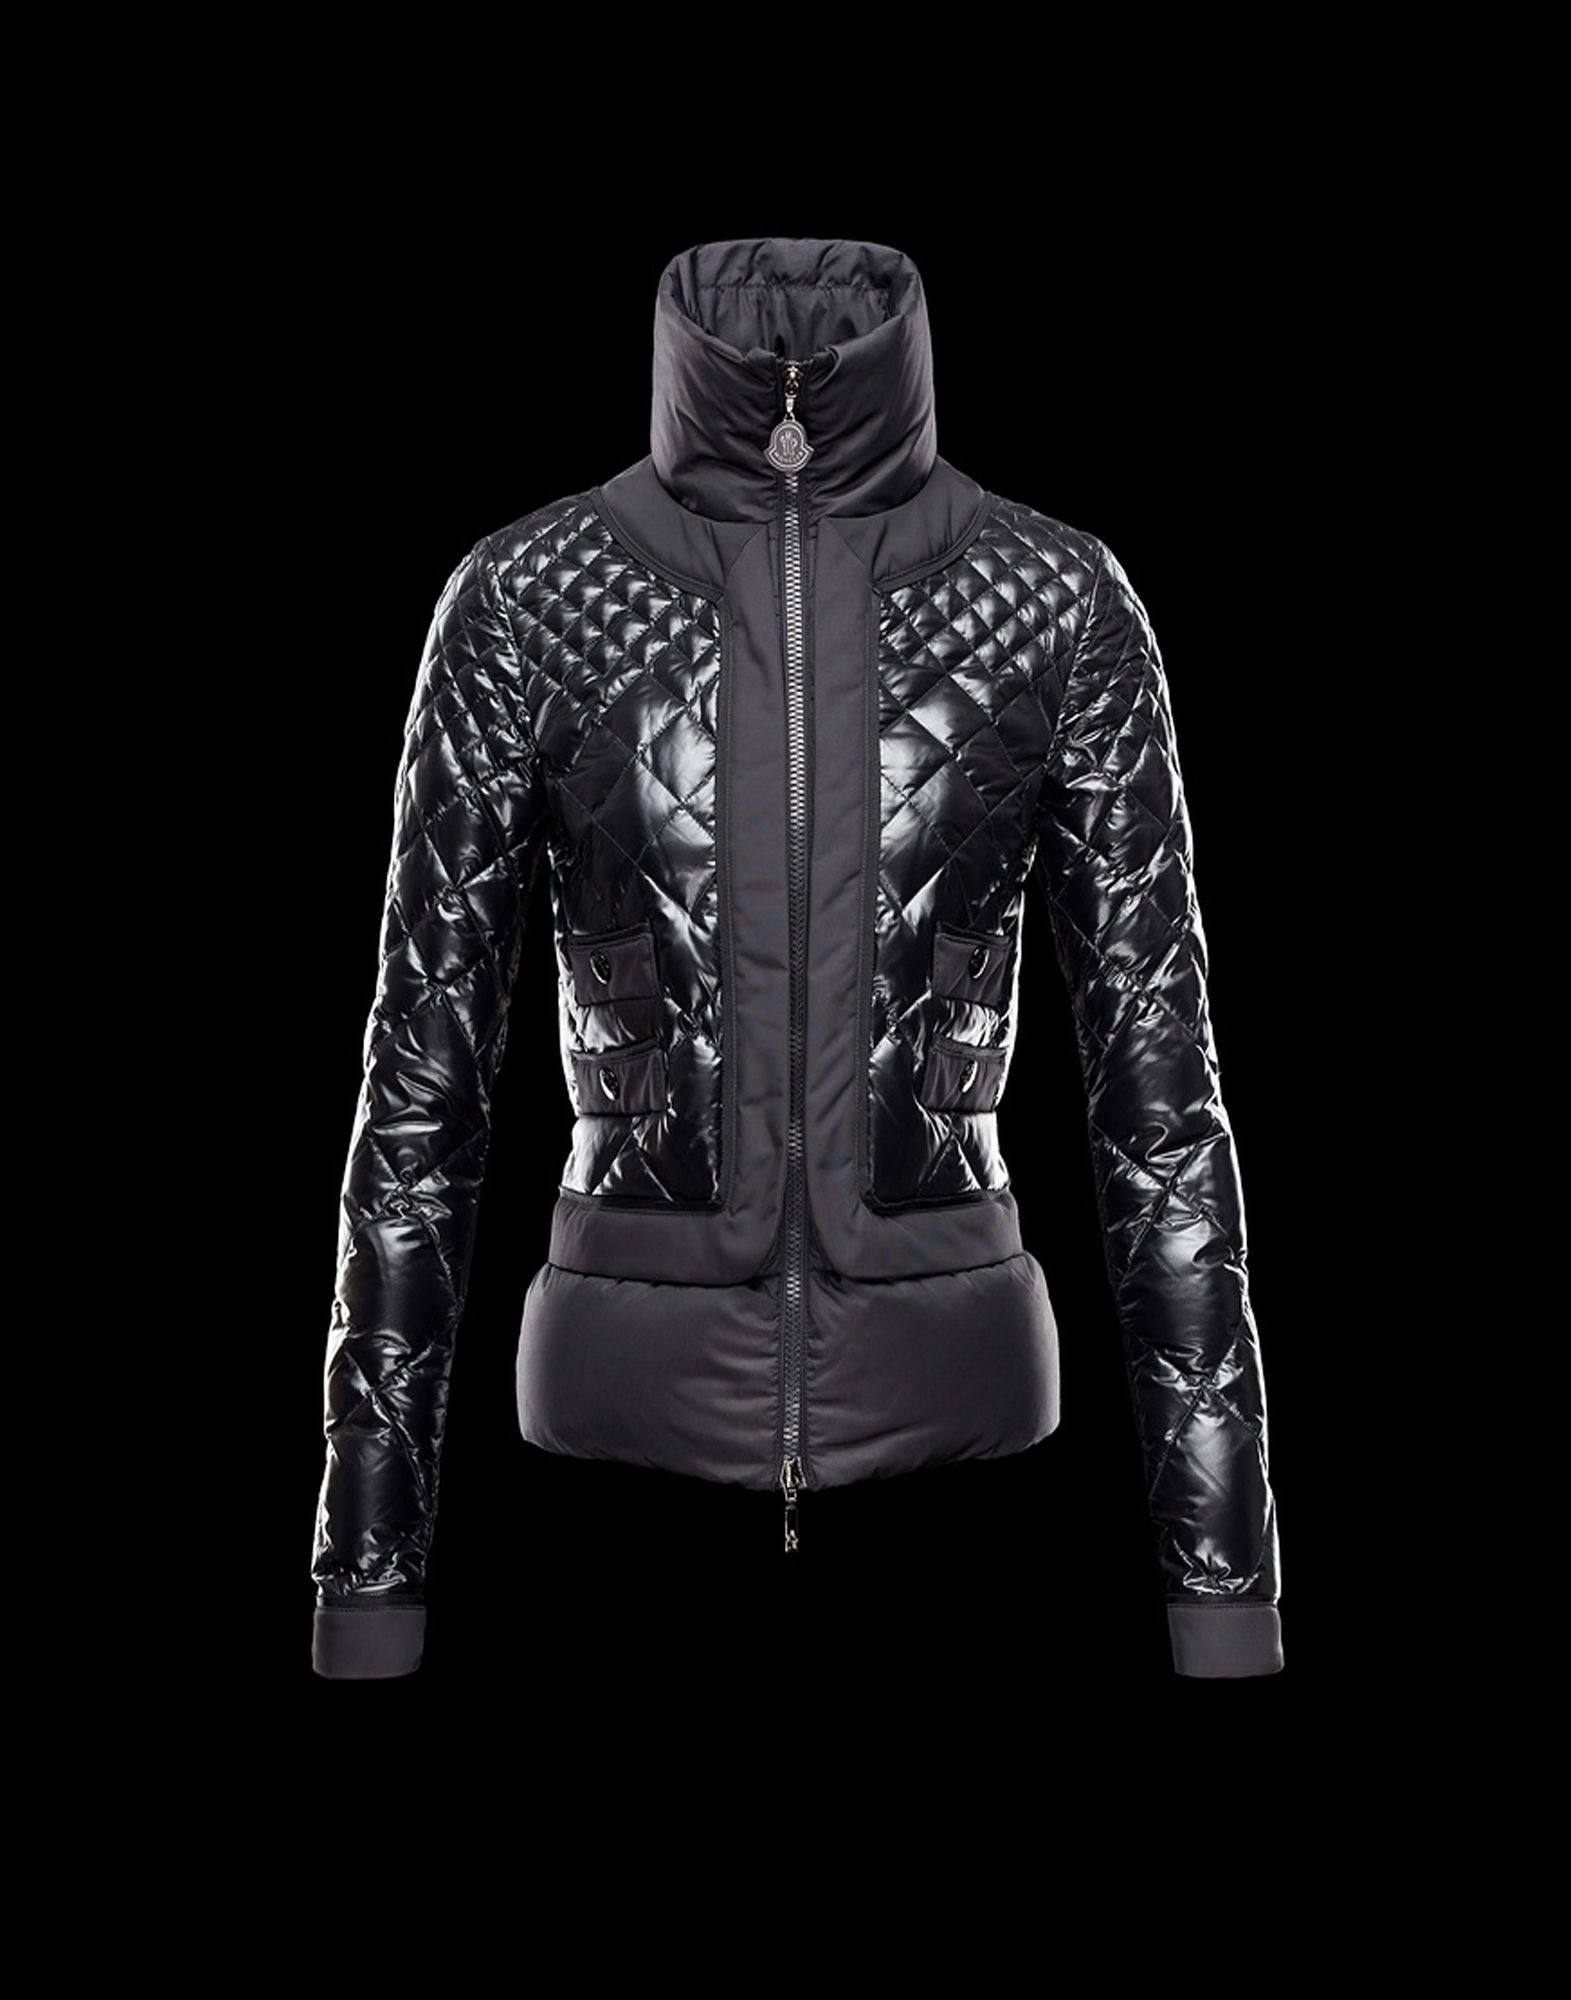 Moncler ecureuil Jackets, Moncler, Winter jackets